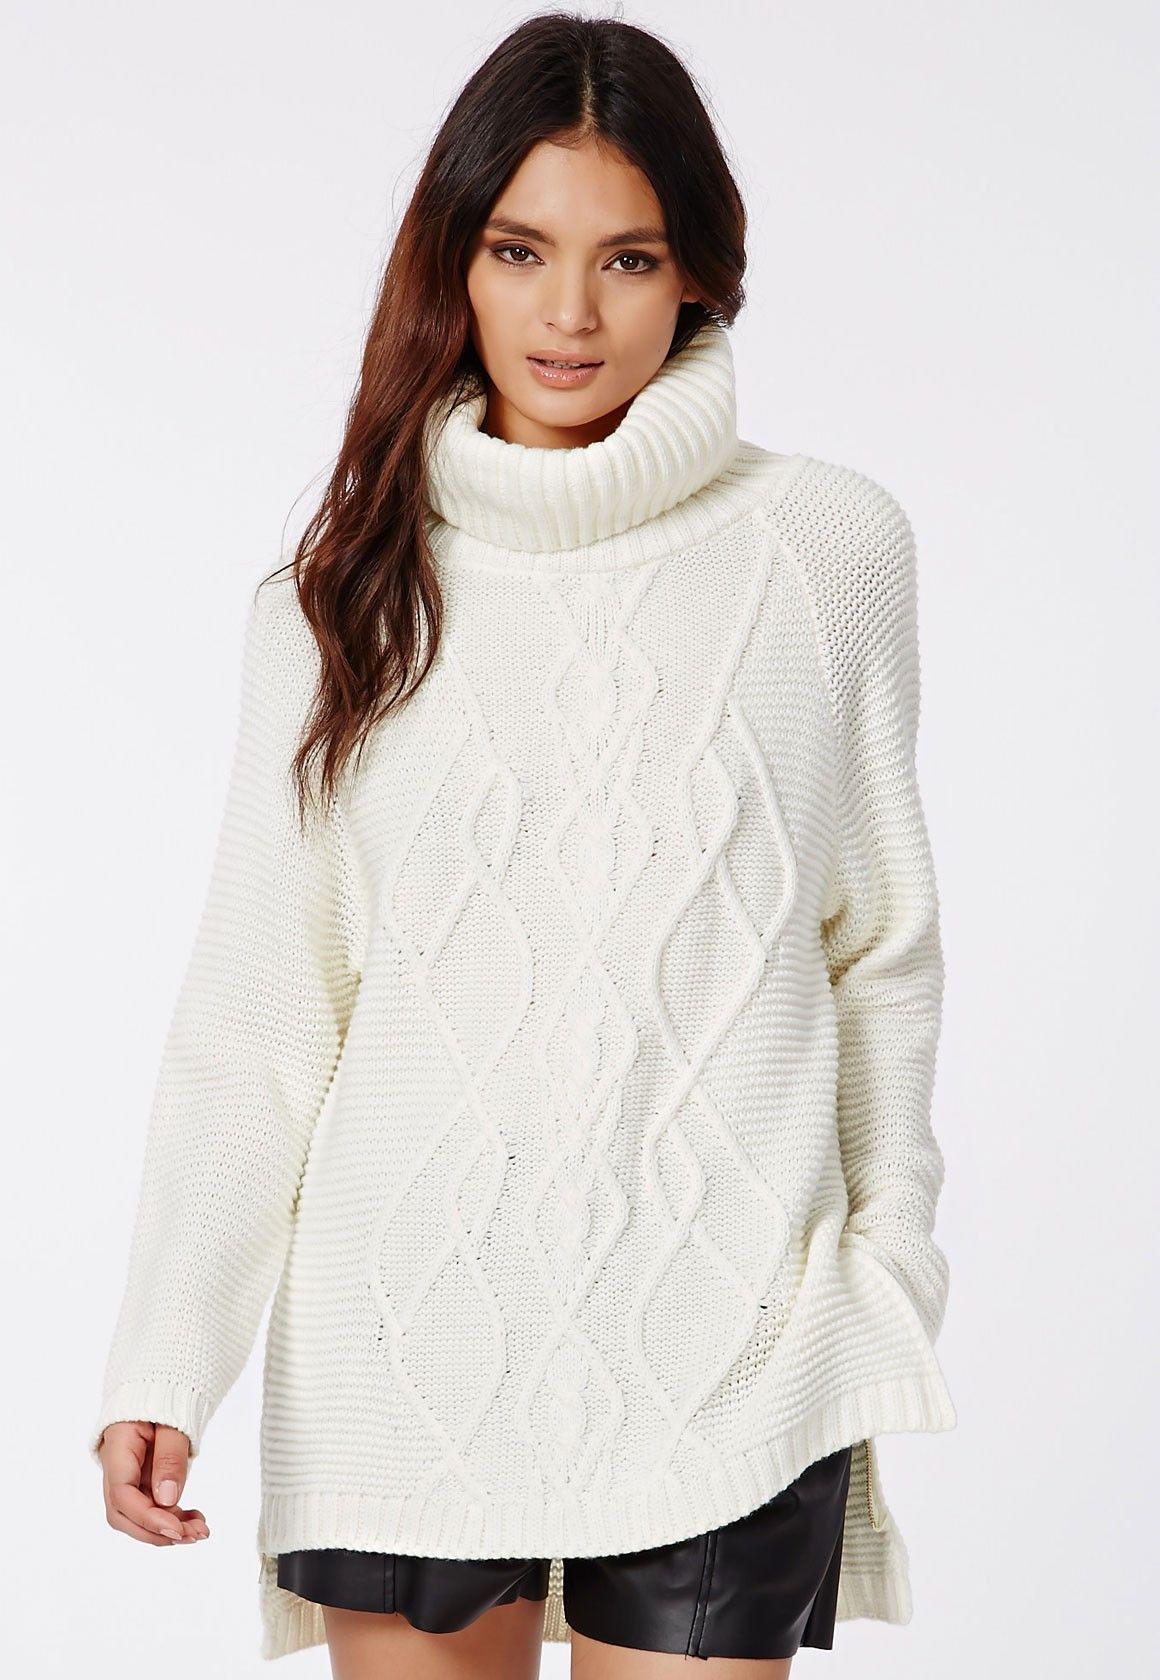 Polo neck dress jumper long